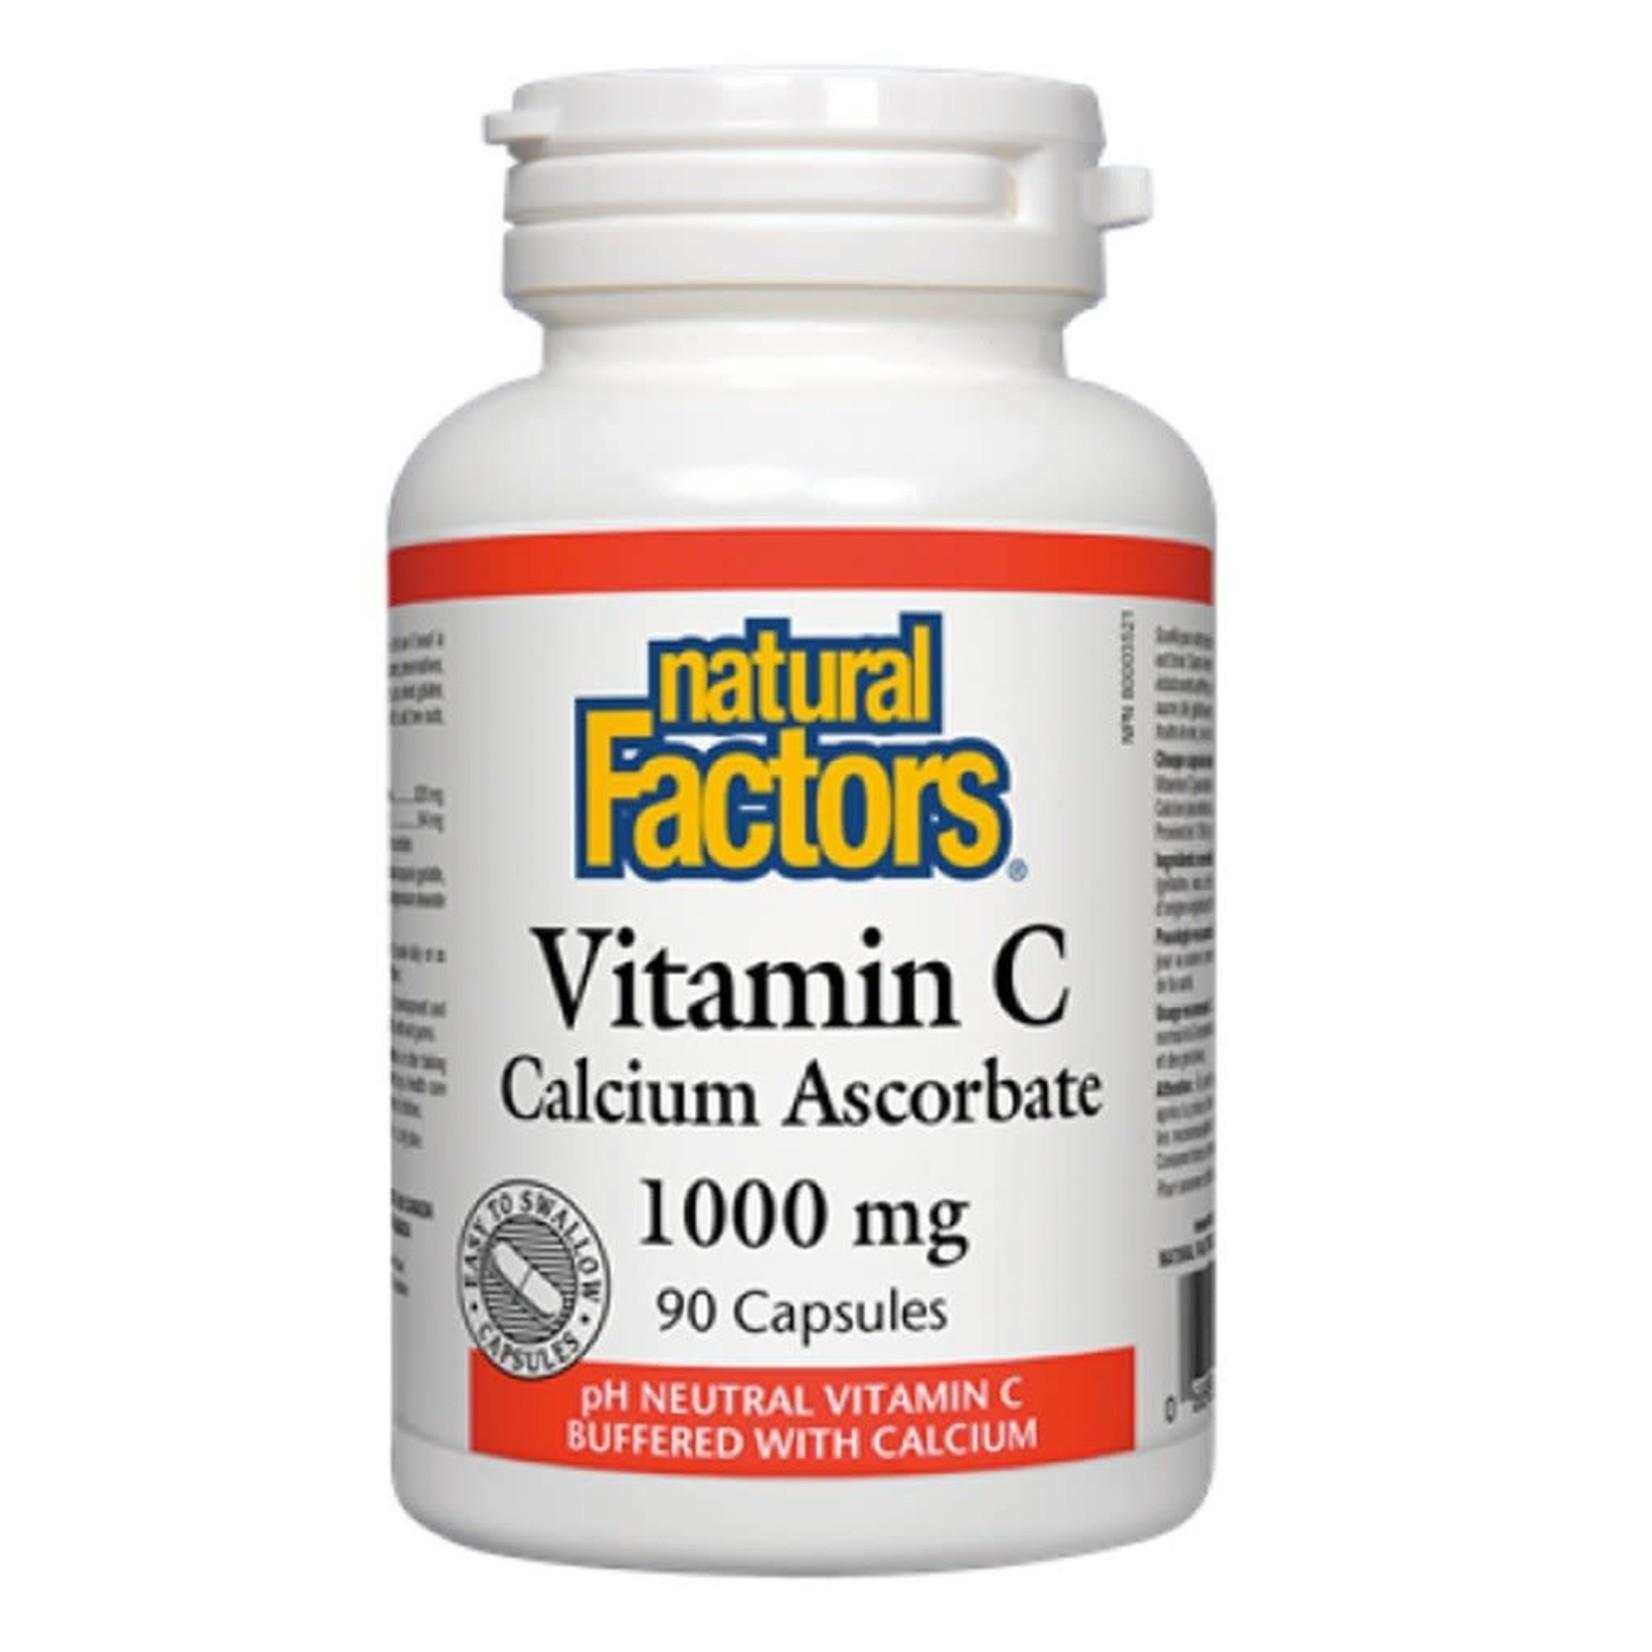 Natural Factors Natural Factors Vitamin C Calcium Ascorbate 1000mg 90 caps